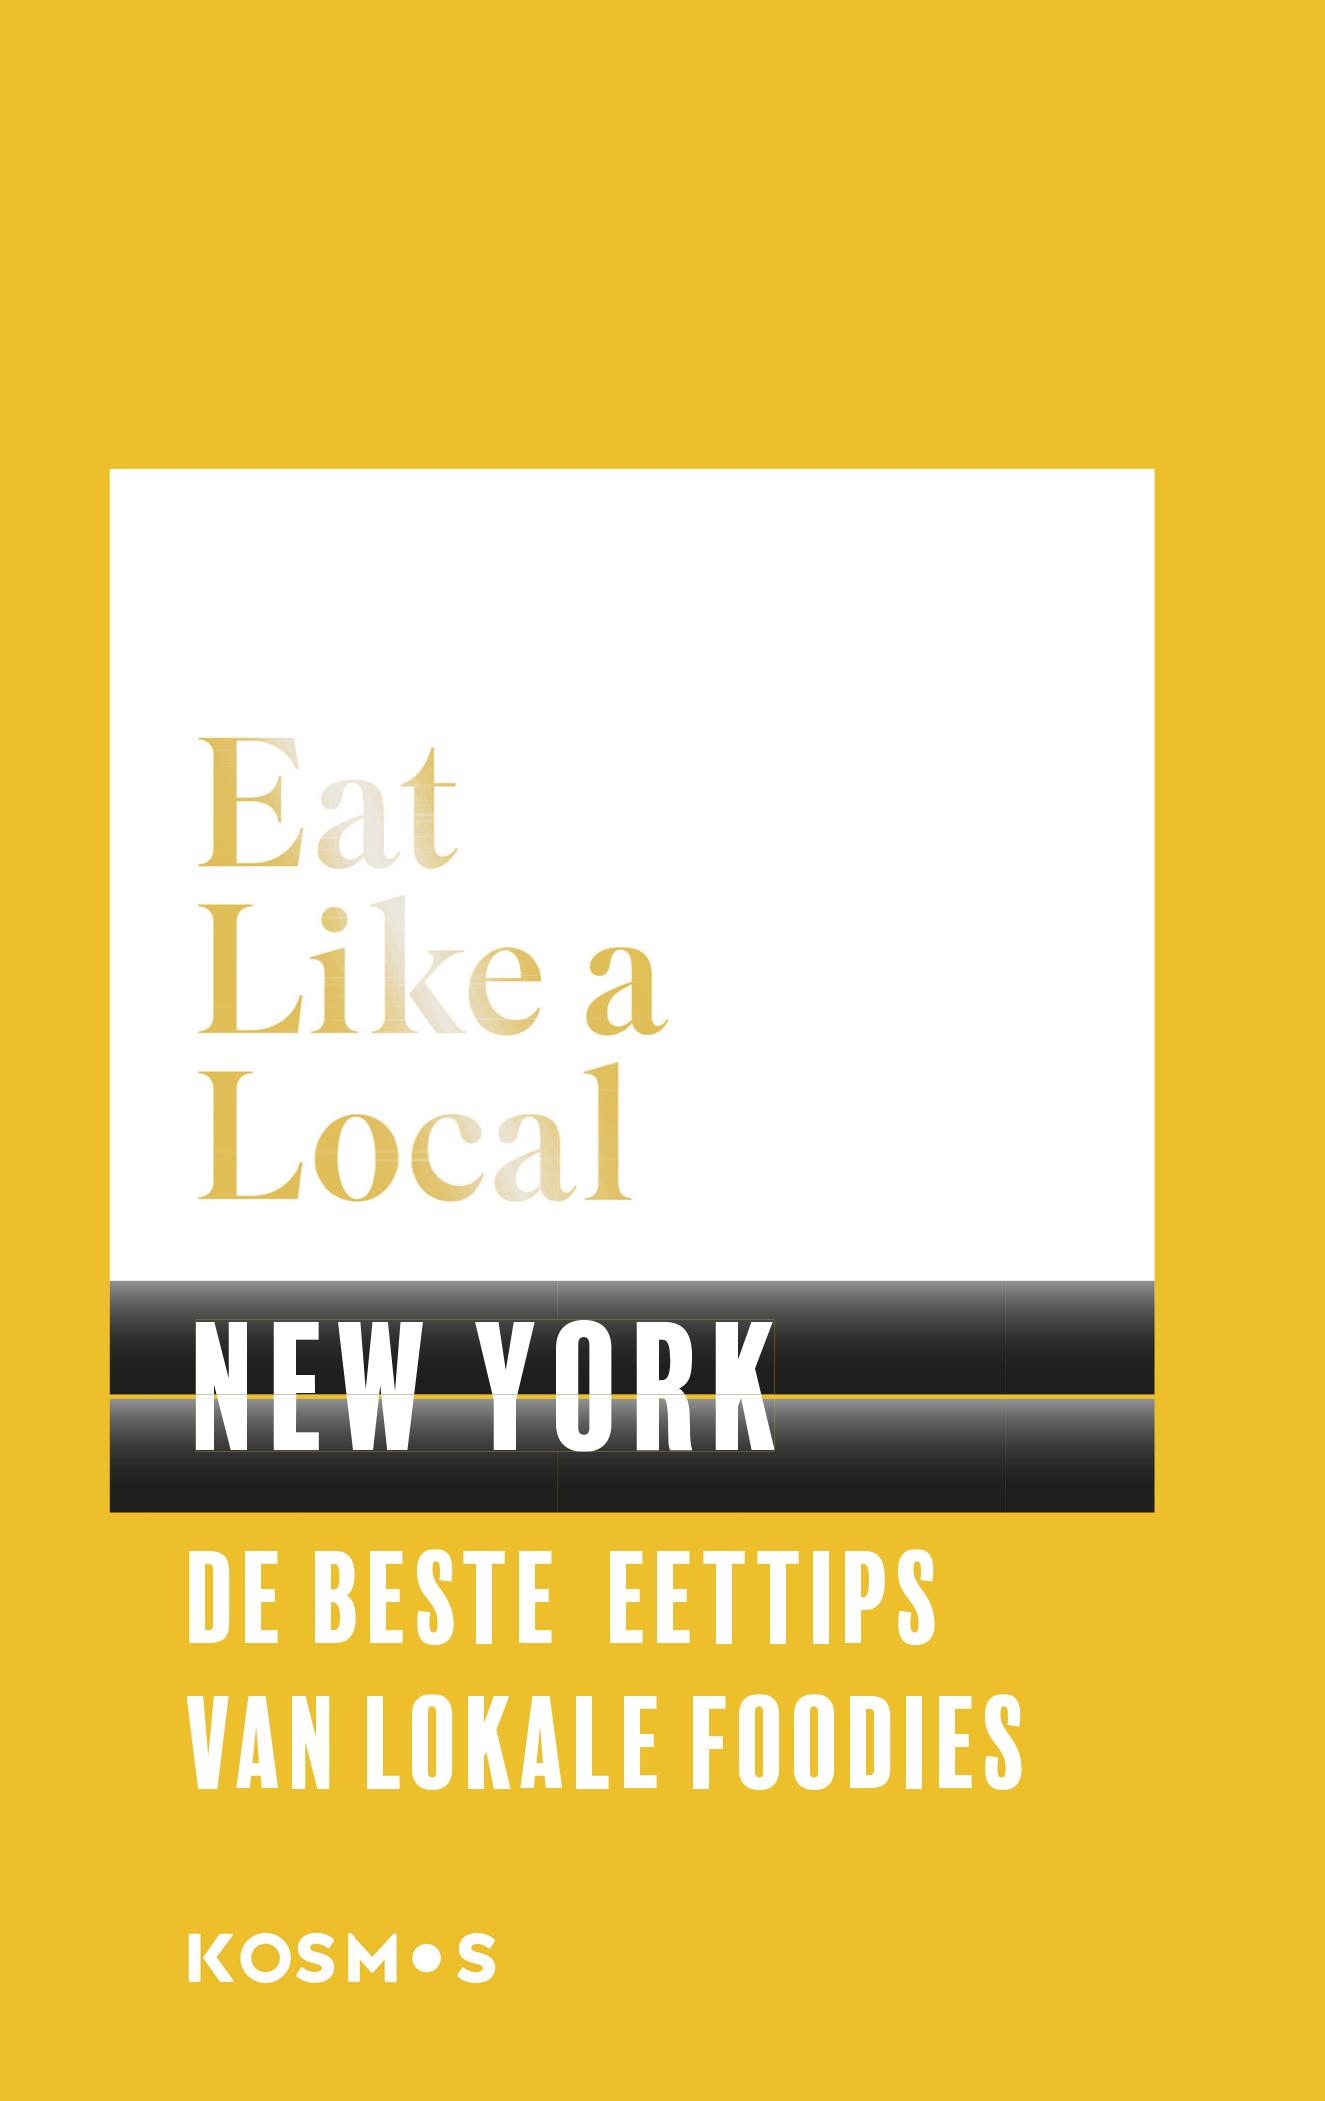 Reisgids Eat like a local New York | Kosmos